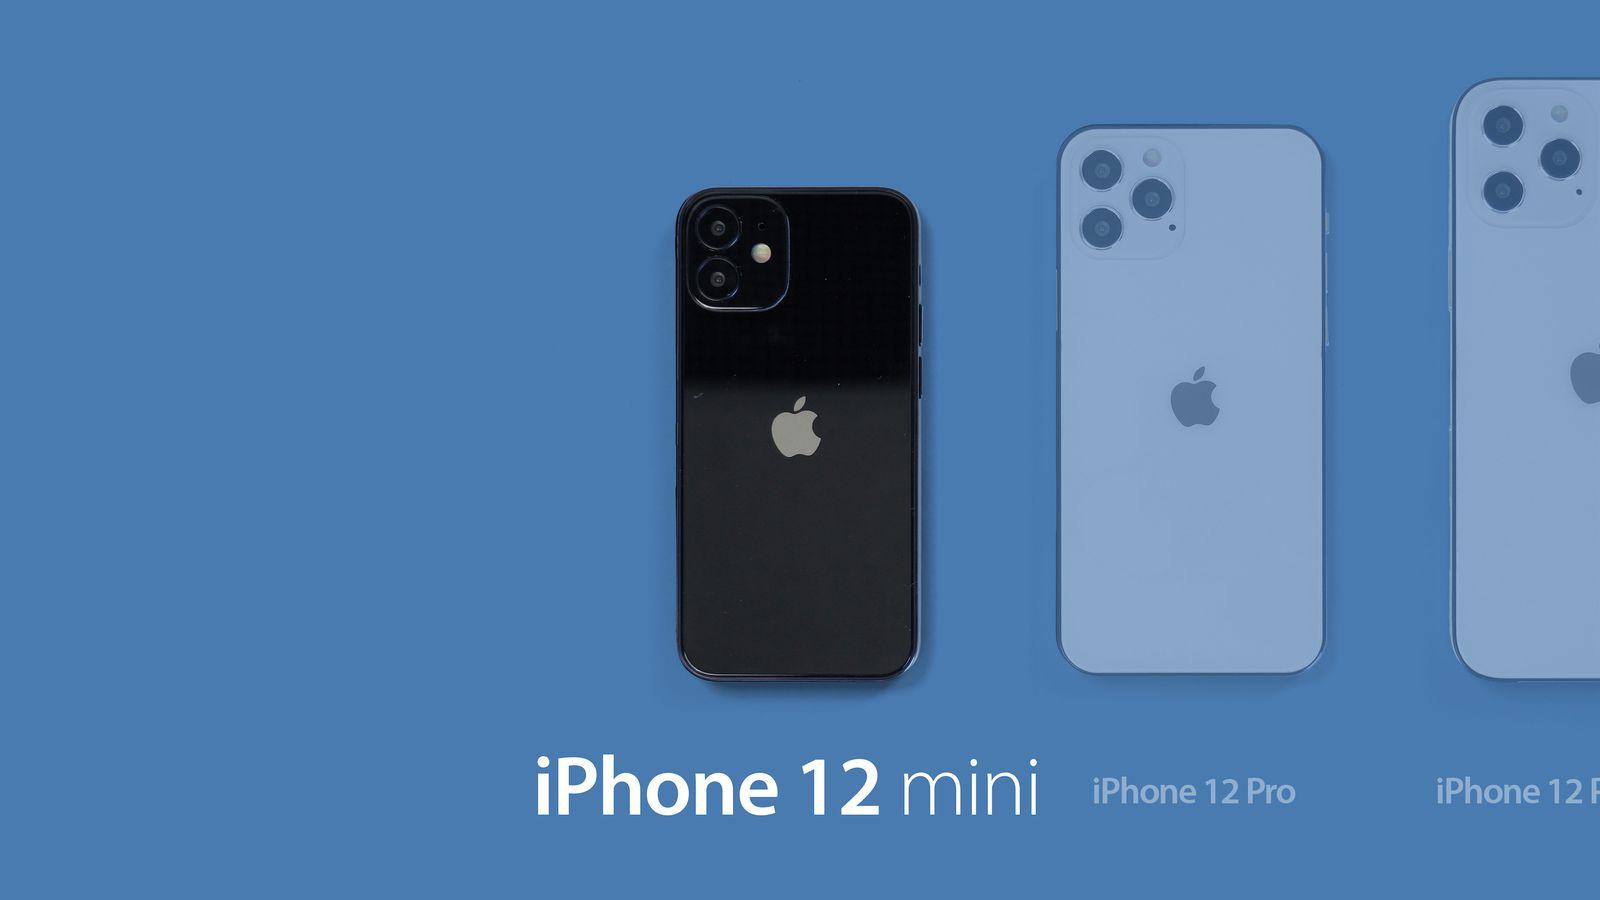 Leaker Iphone 12 Mini And Iphone 12 Storage Capacities Start At 64gb Pro Models At 128gb Macrumors